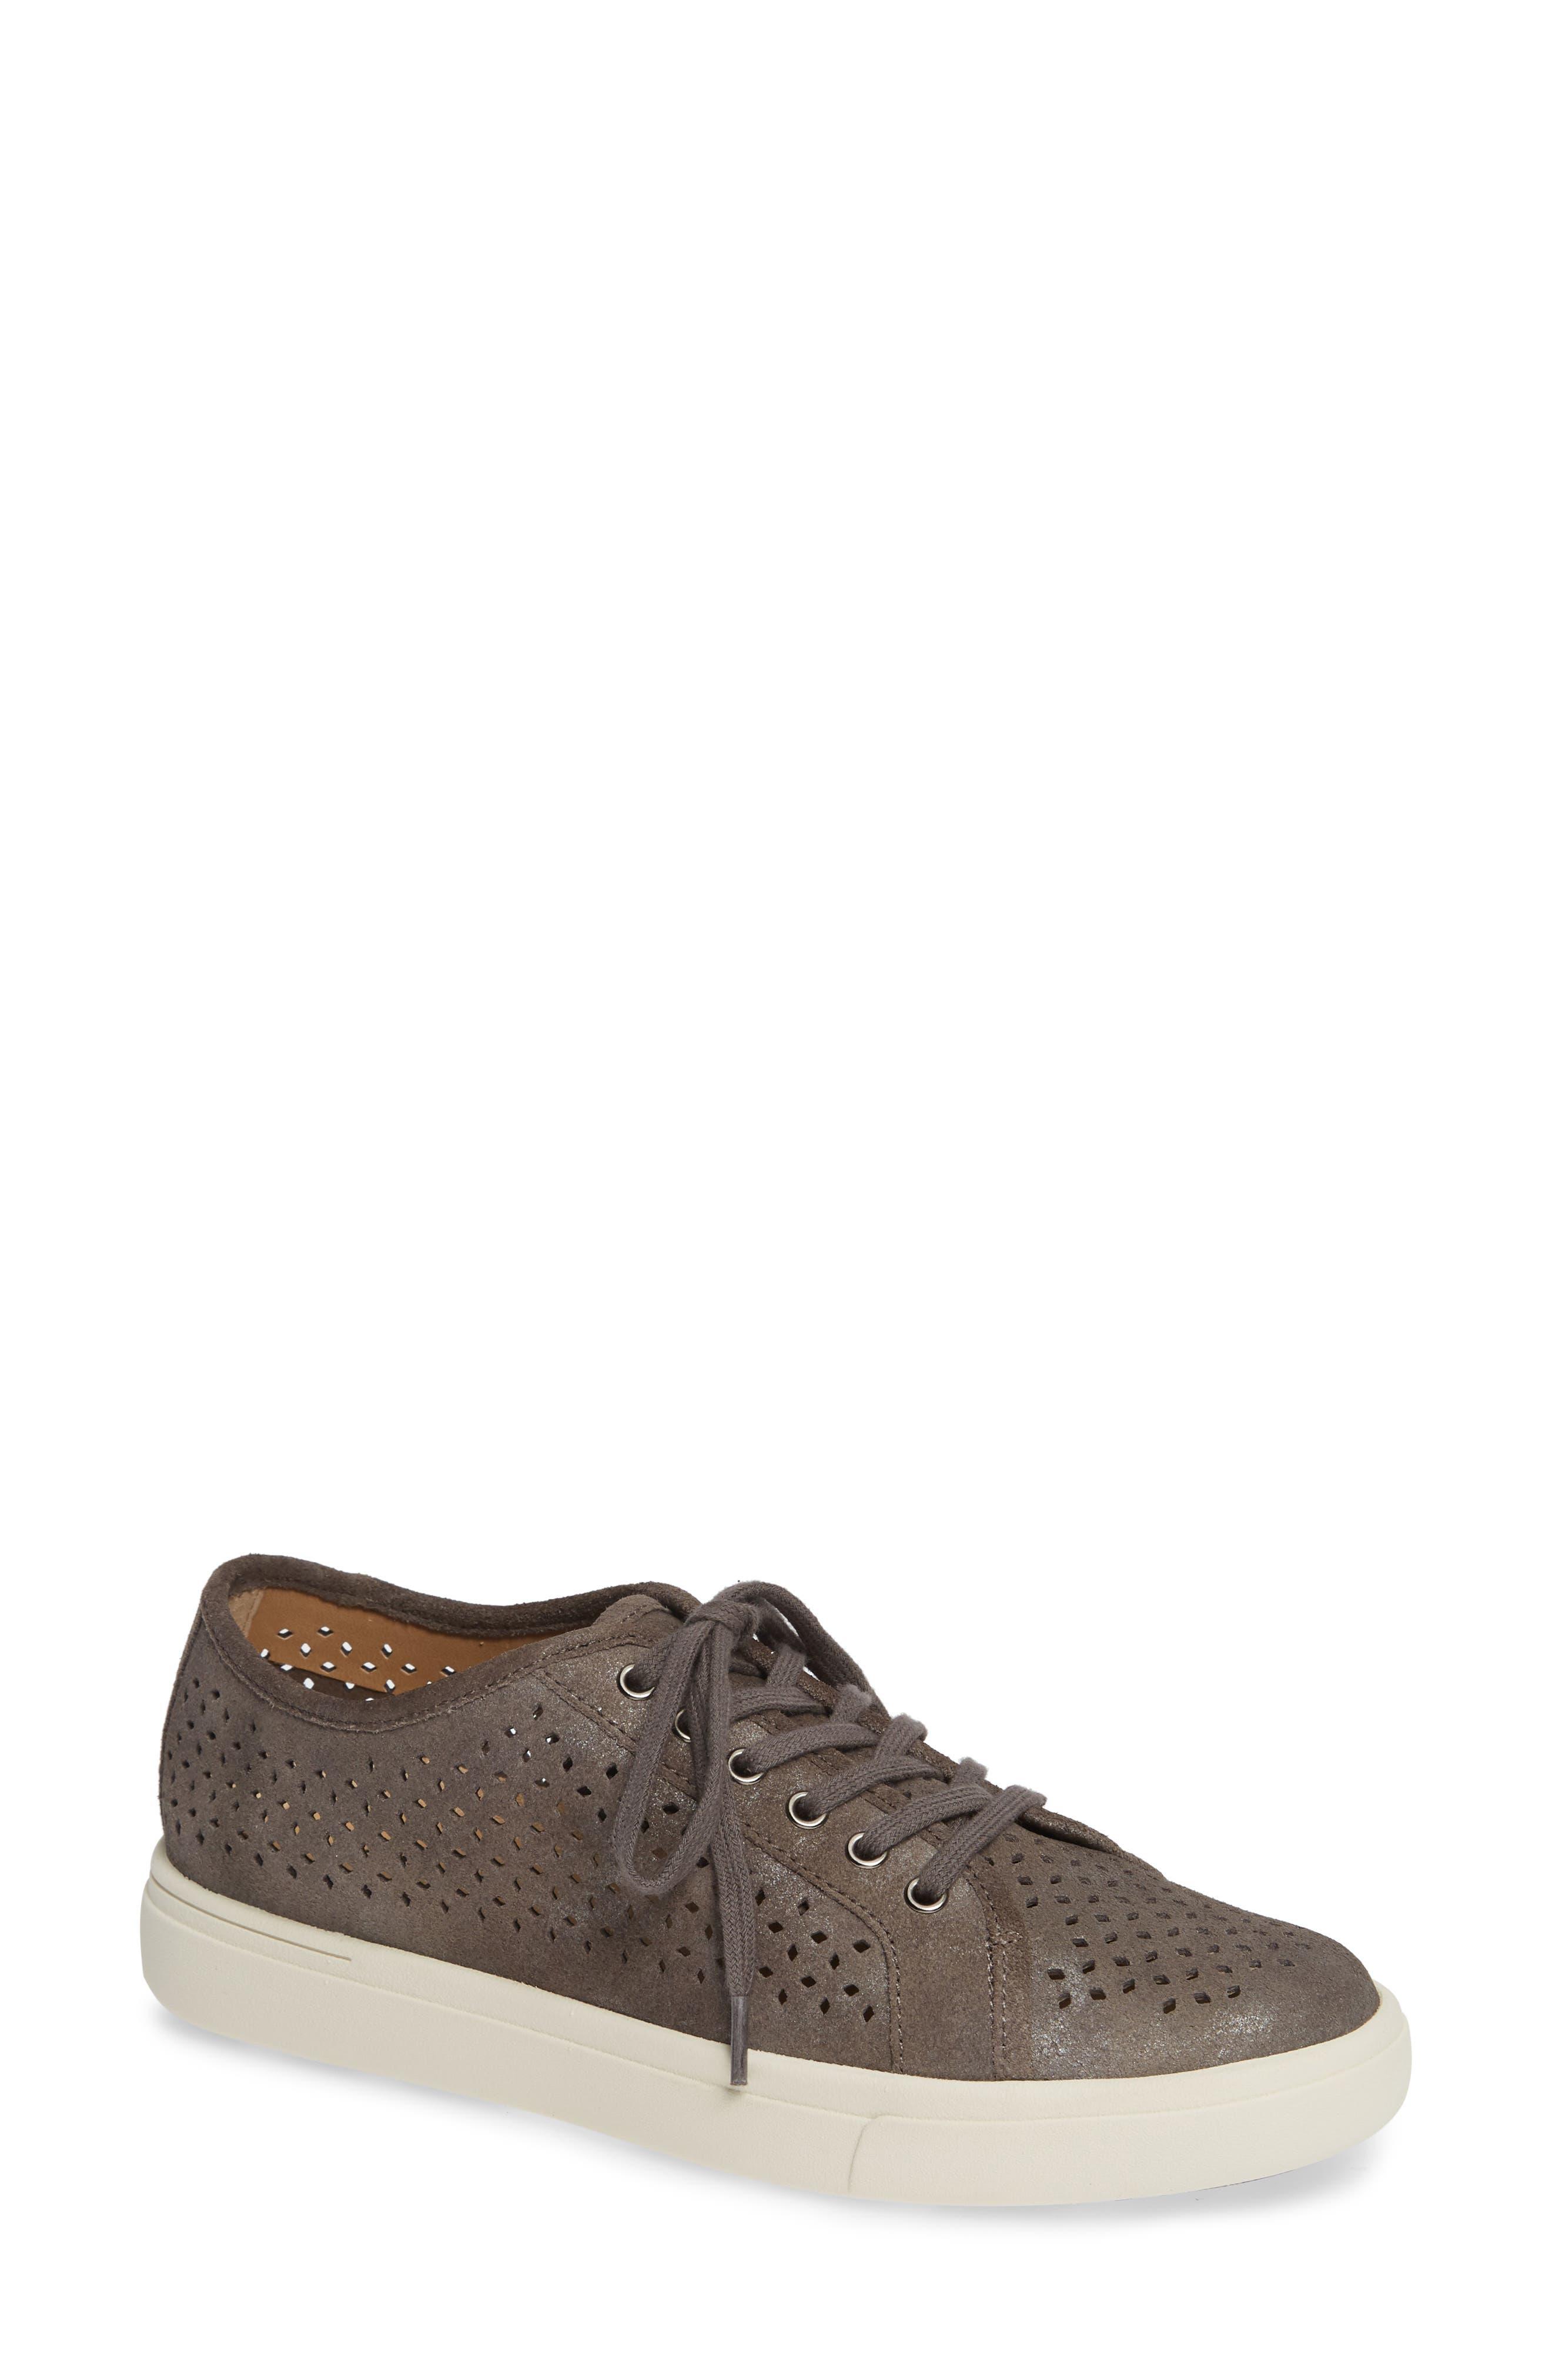 Oneida Sneaker,                             Main thumbnail 1, color,                             GREY SUEDE